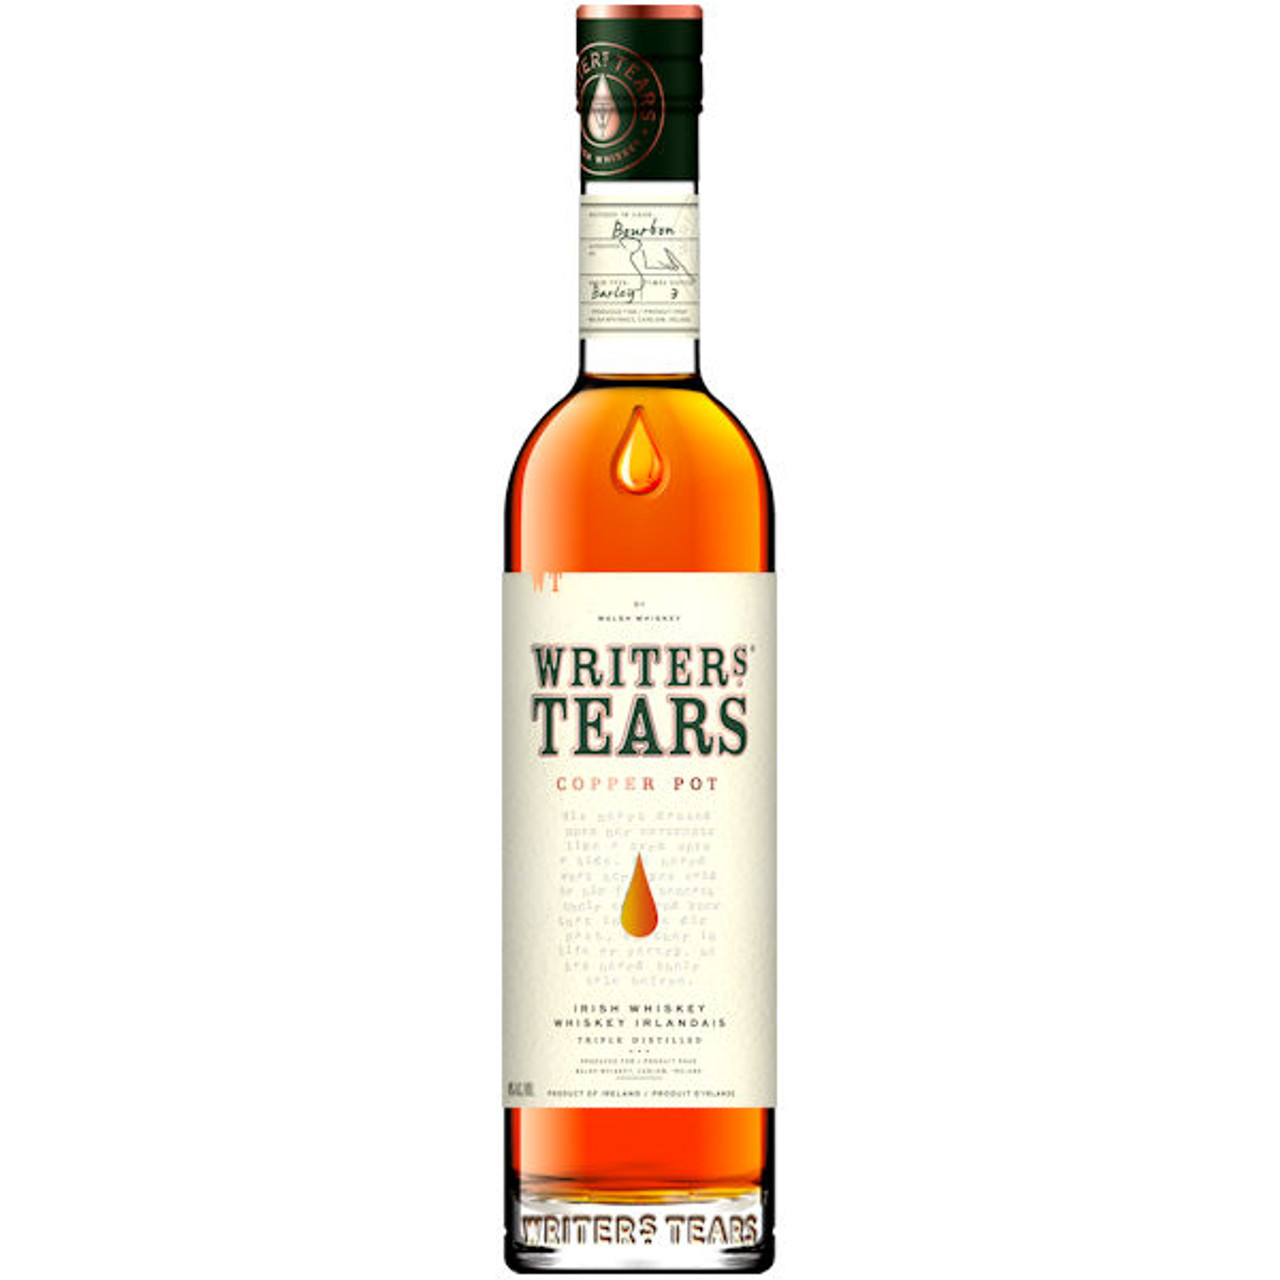 Writers' Tears Copper Pot Irish Whiskey 750ml